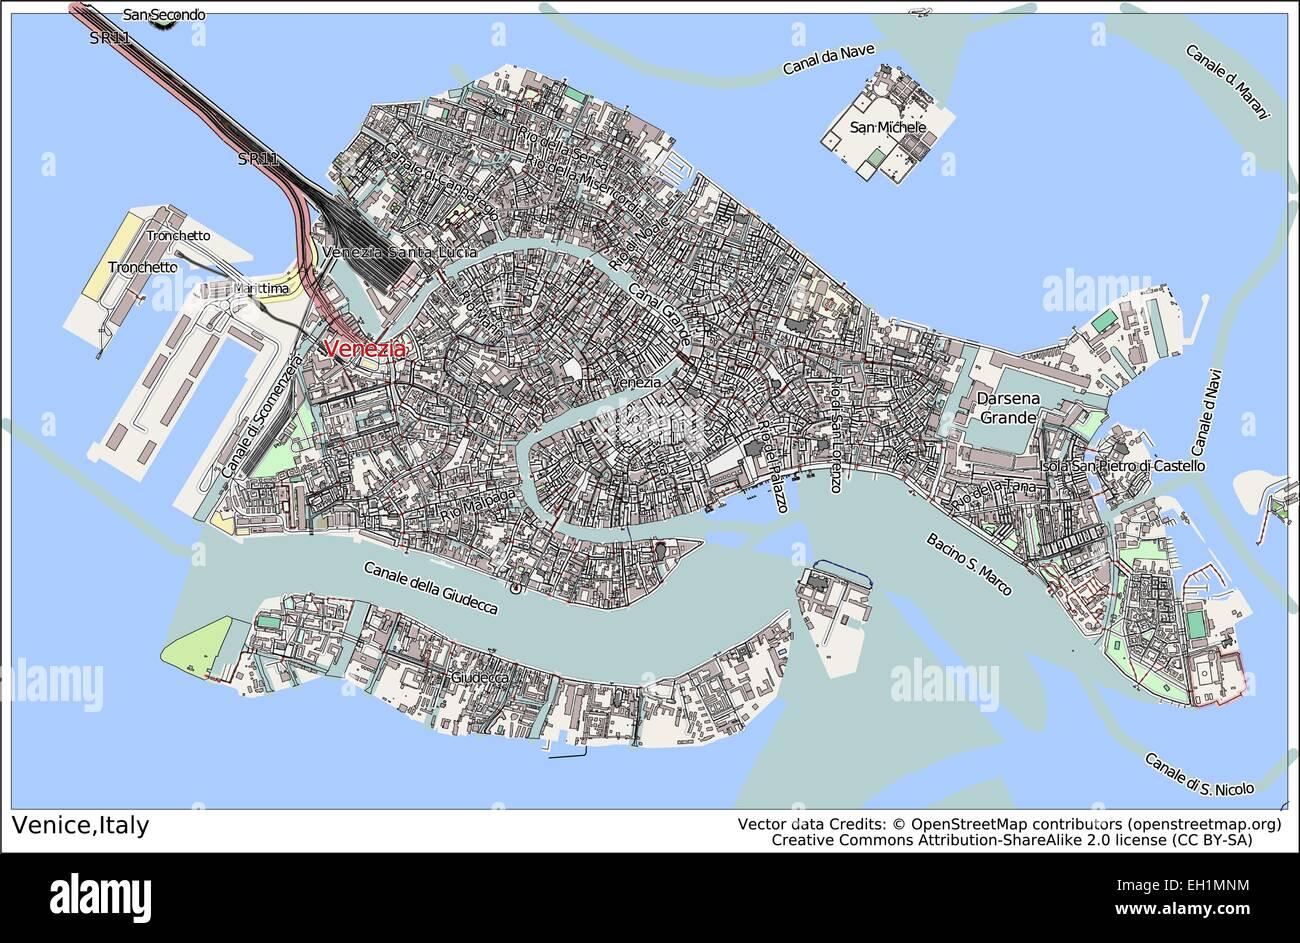 Venice Italy Island City Map Stock Vector Art Illustration - Venice city map